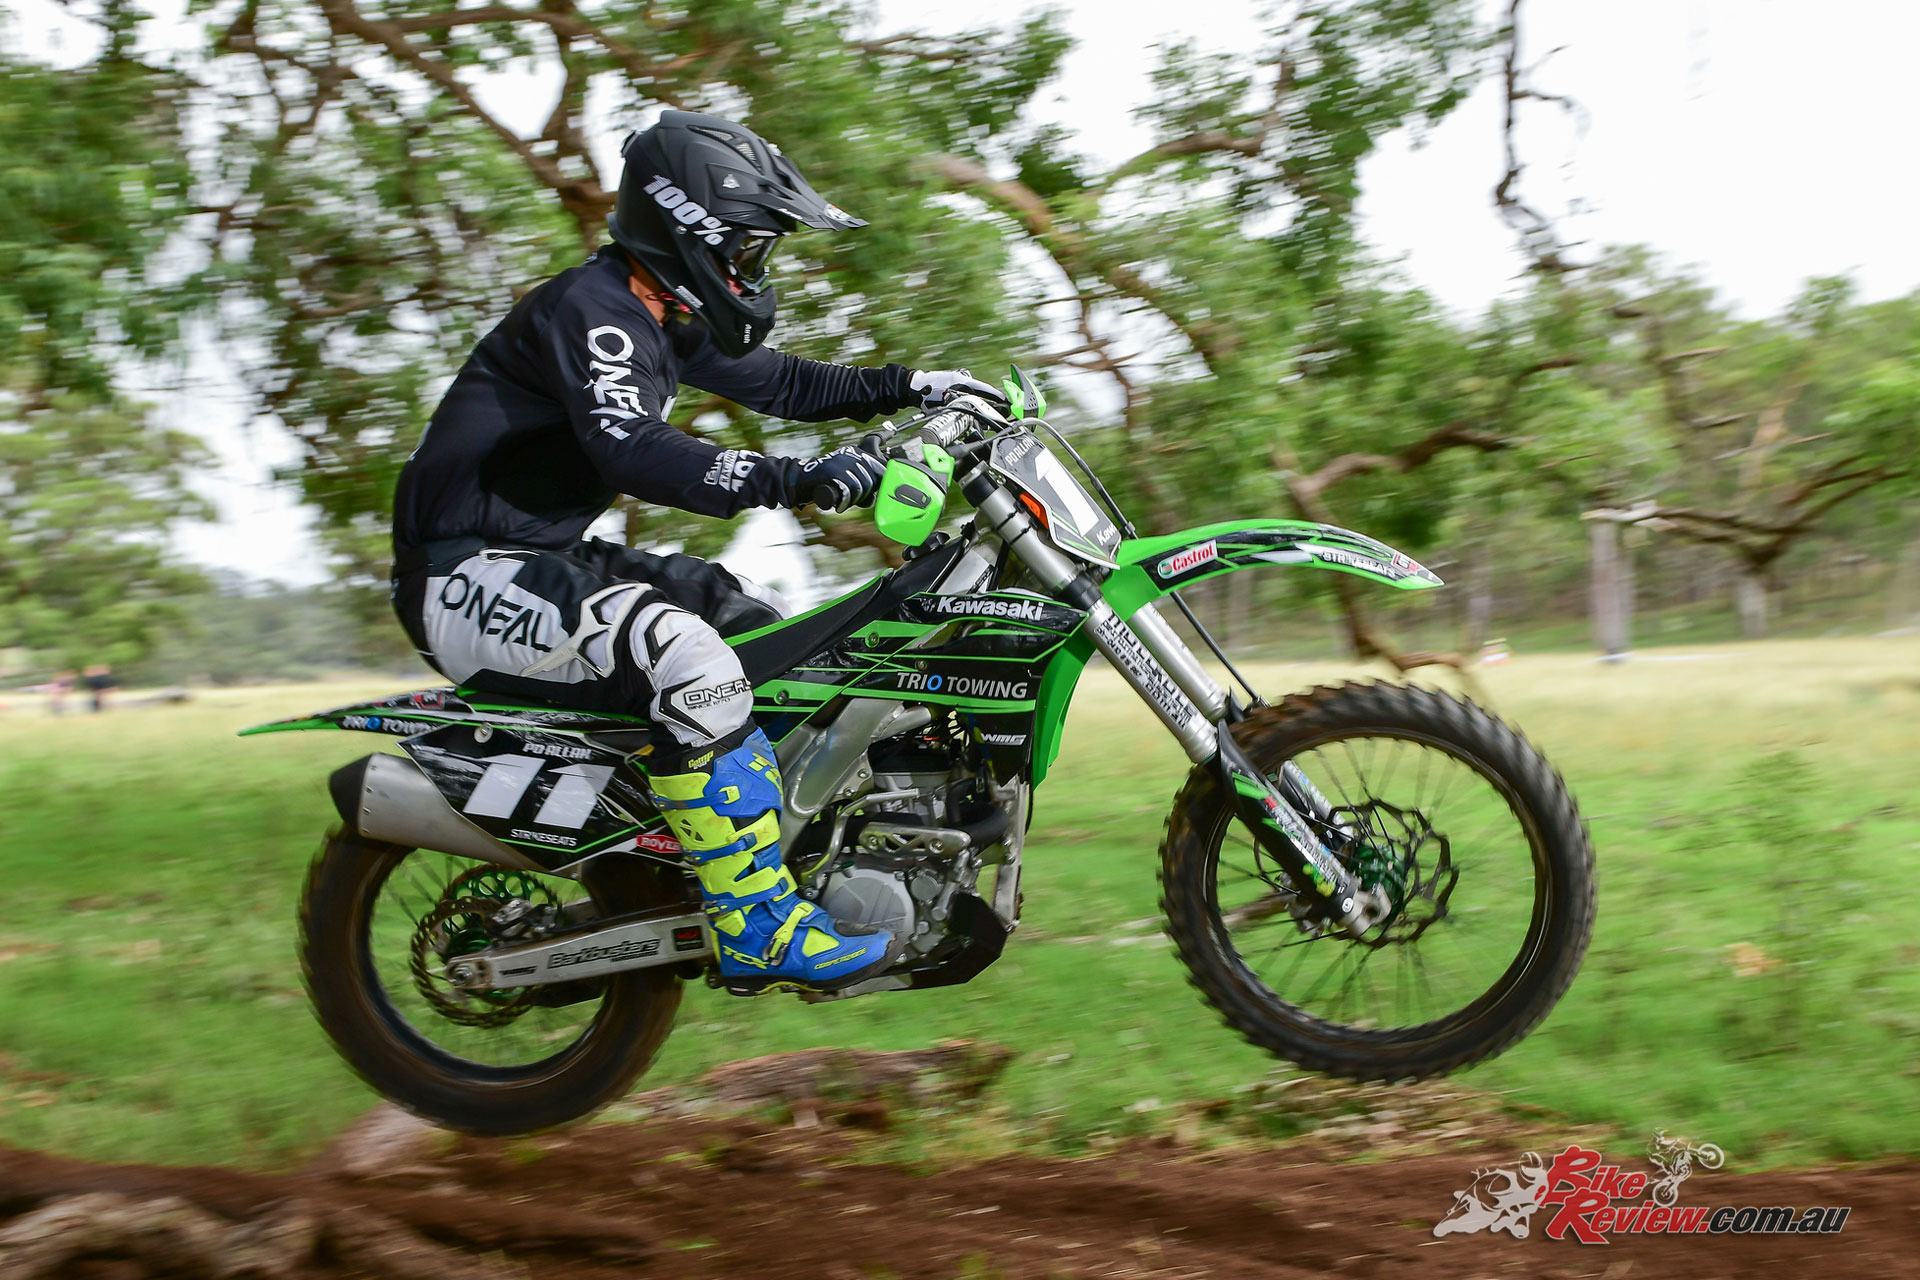 Peter Daniel 'PD' Allan - Kawasaki Castrol Racing Team